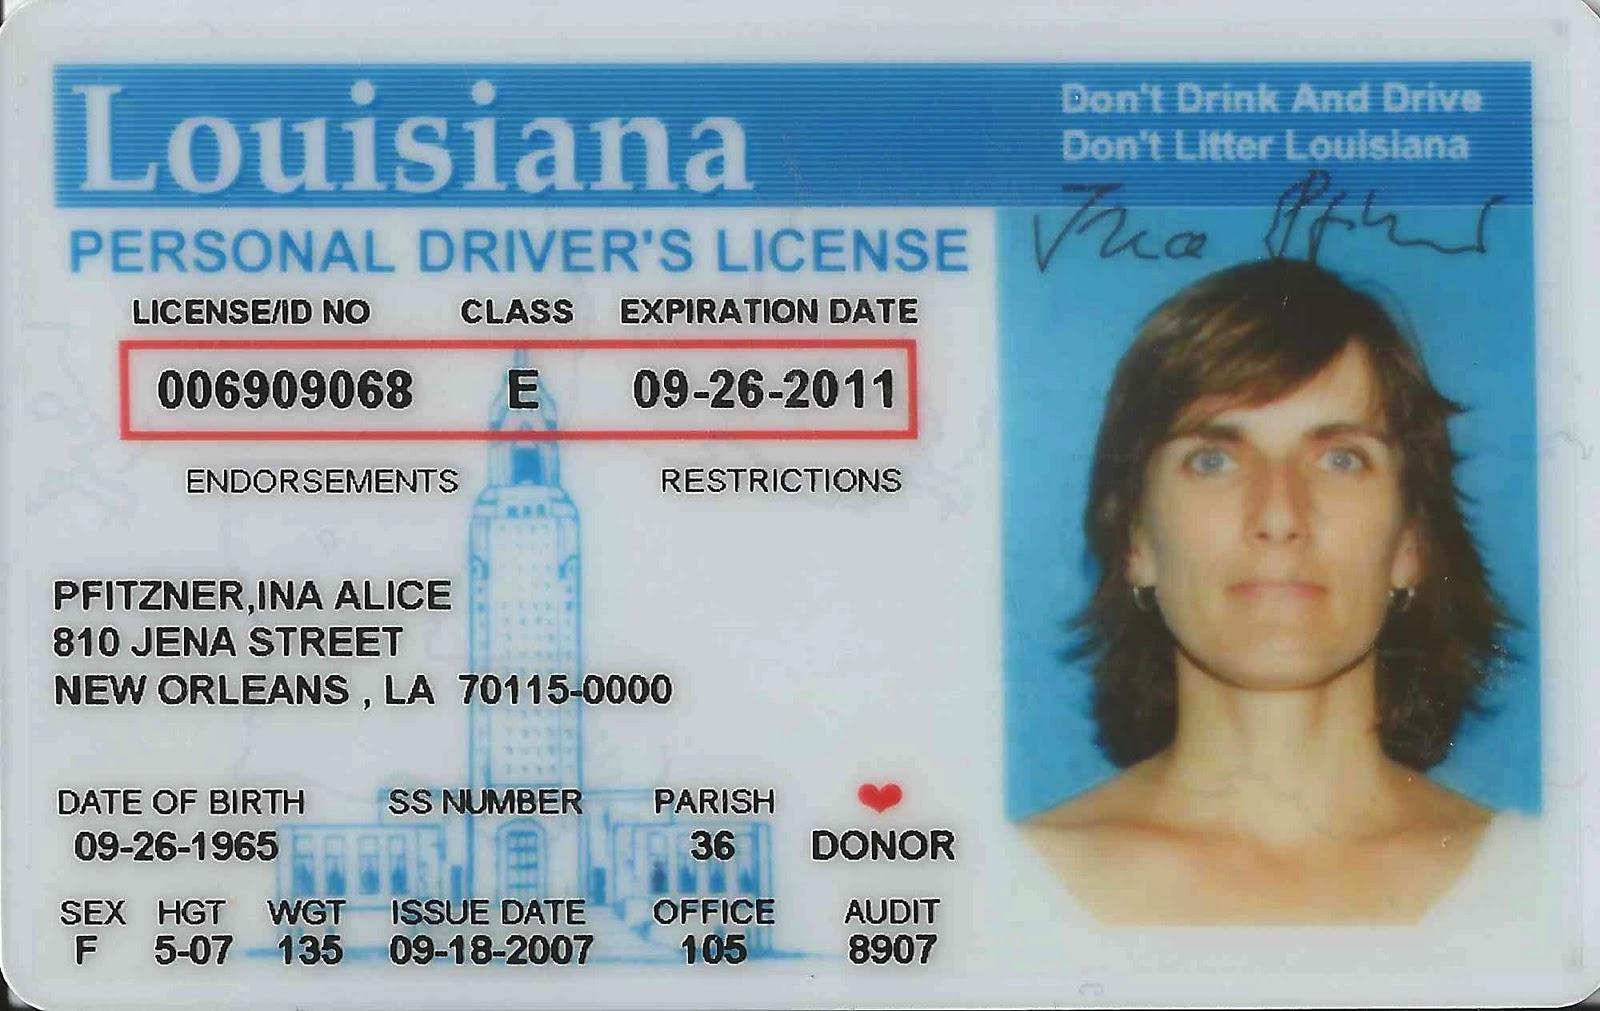 Louisiana Drivers License | galleryhip.com - The Hippest Pics